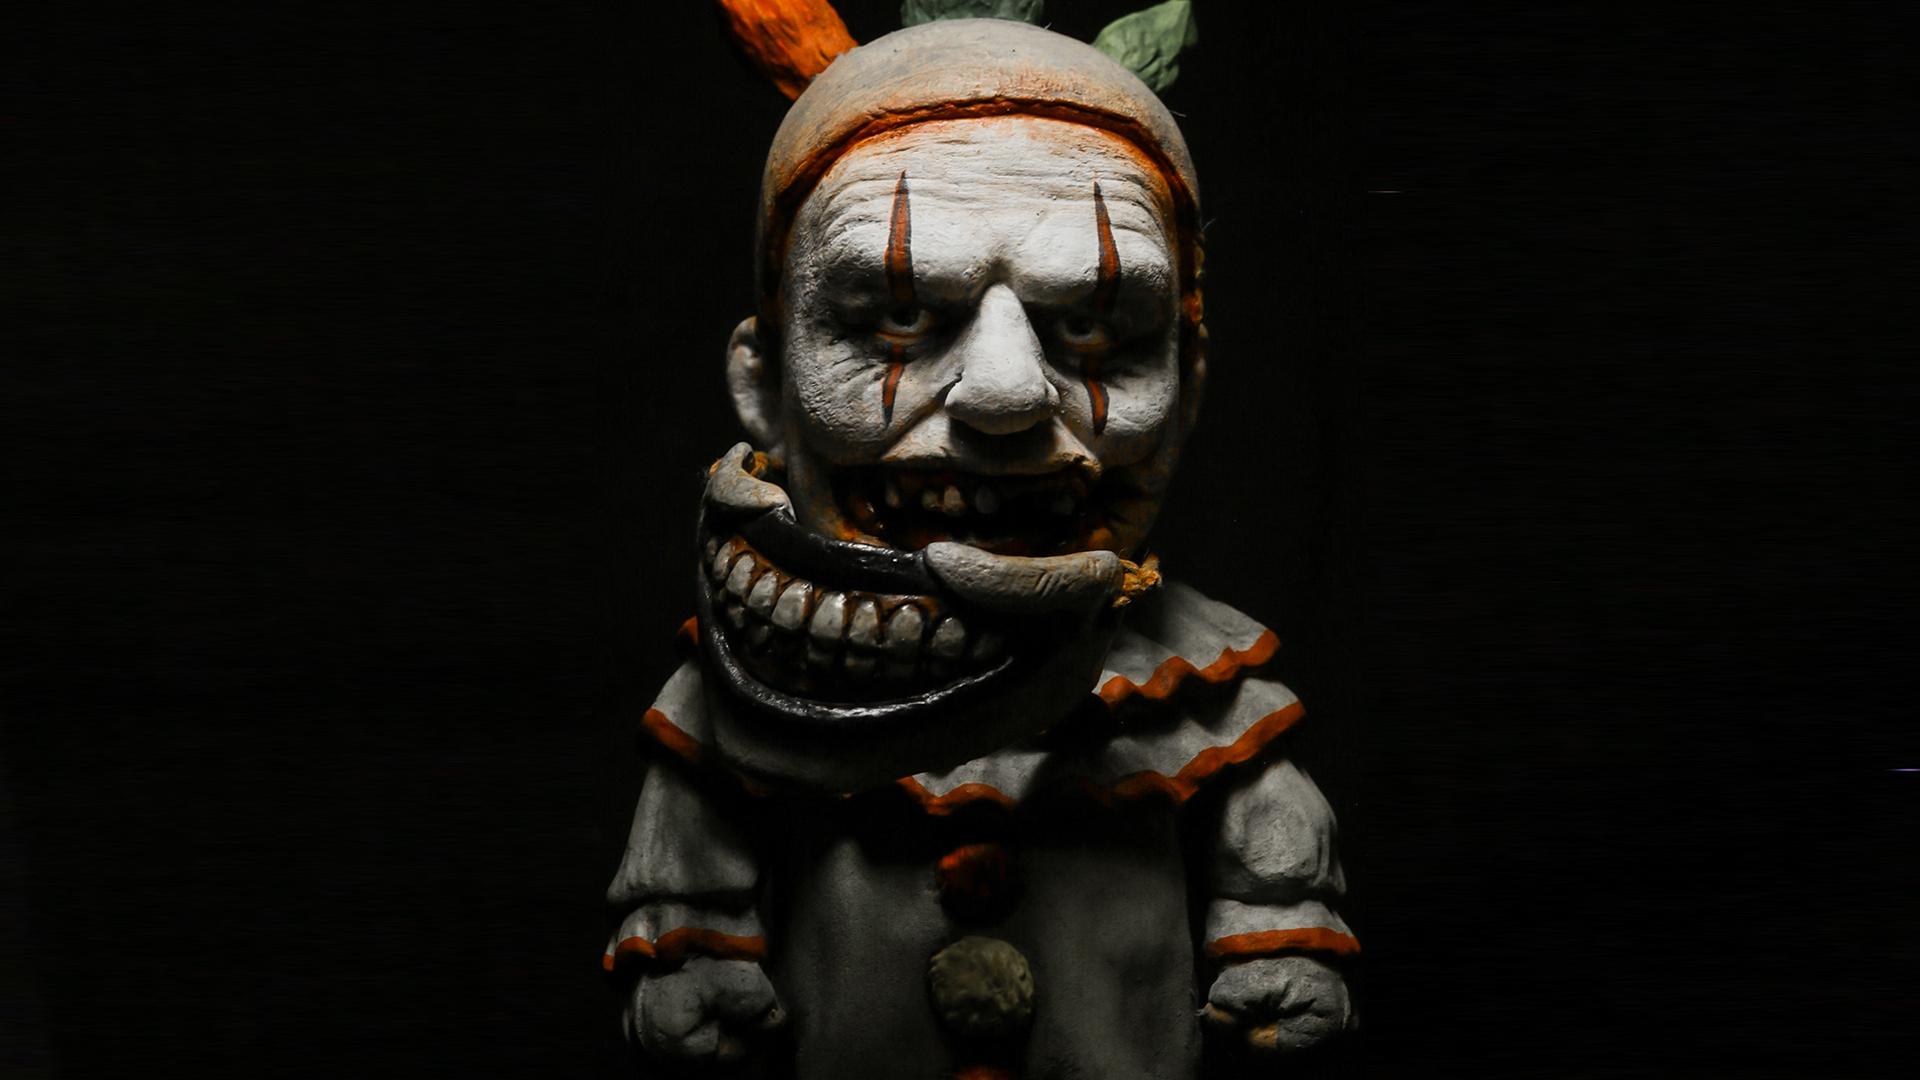 Wallpaper Clowns Dark Gore Horror 1920x1080 Artg